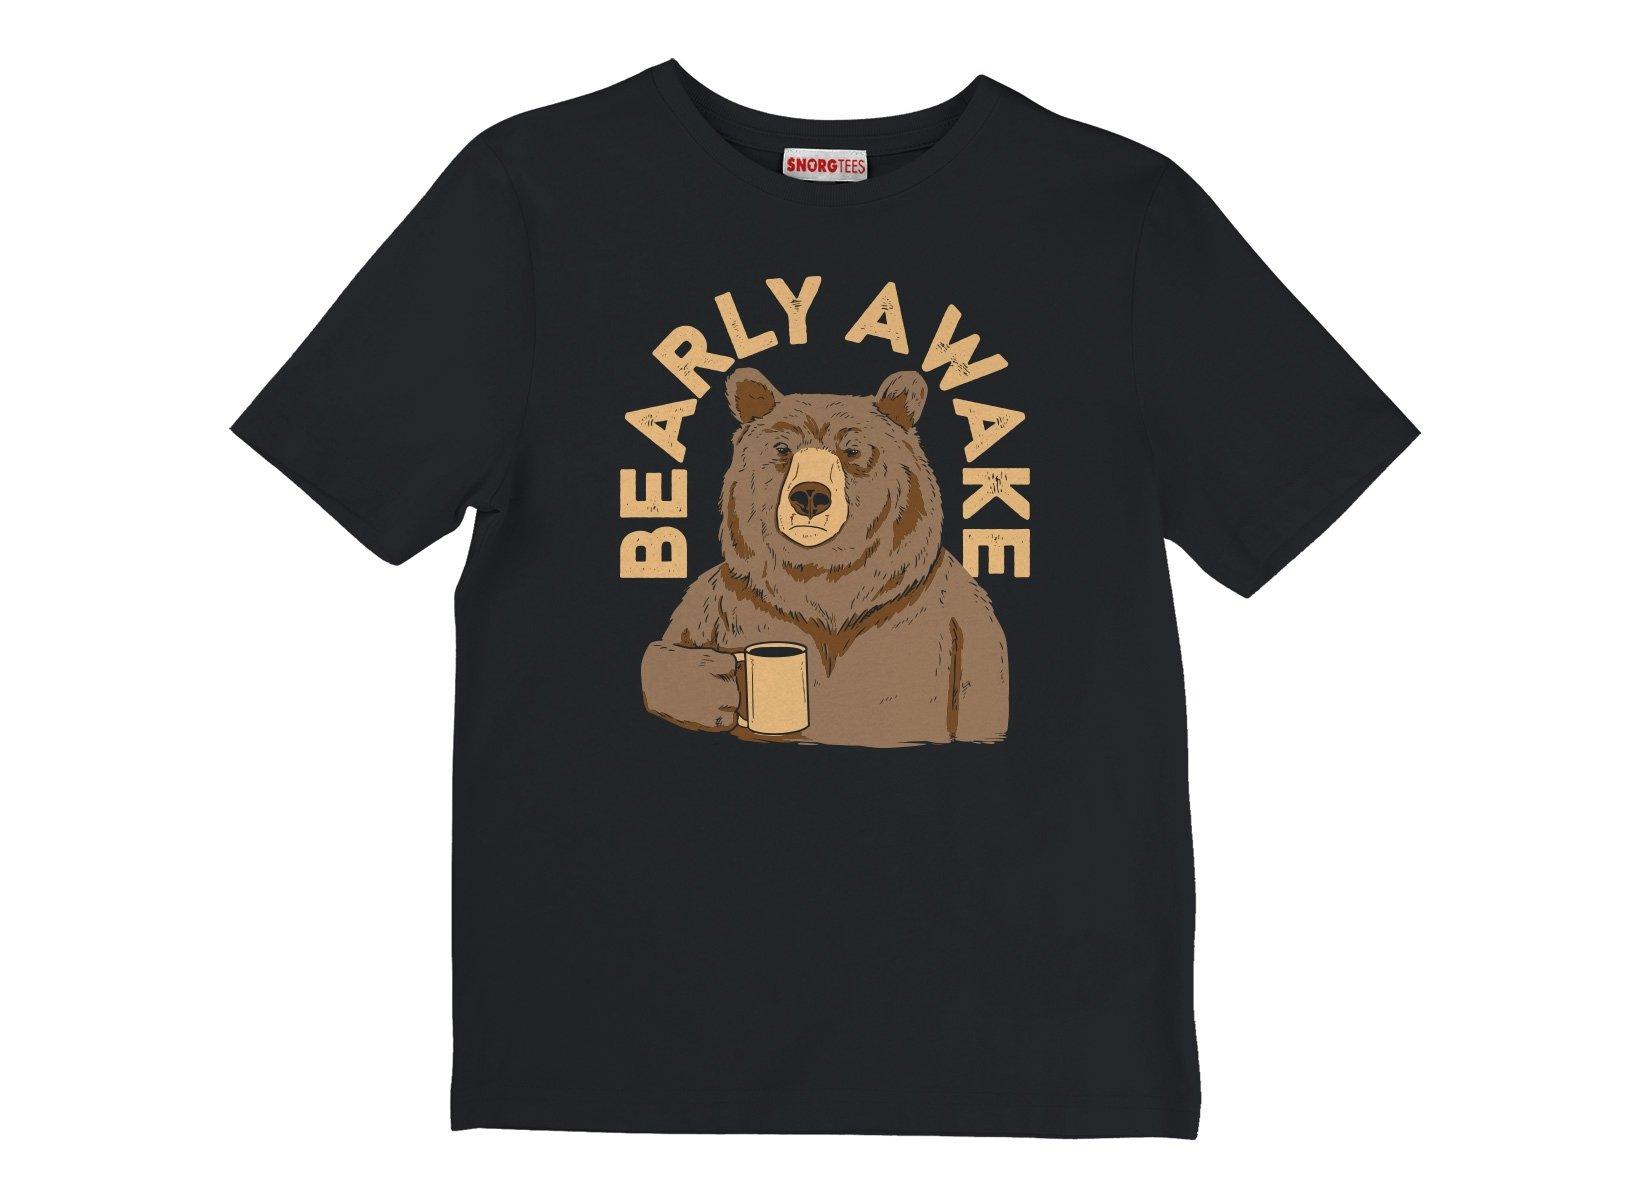 Bearly Awake on Kids T-Shirt